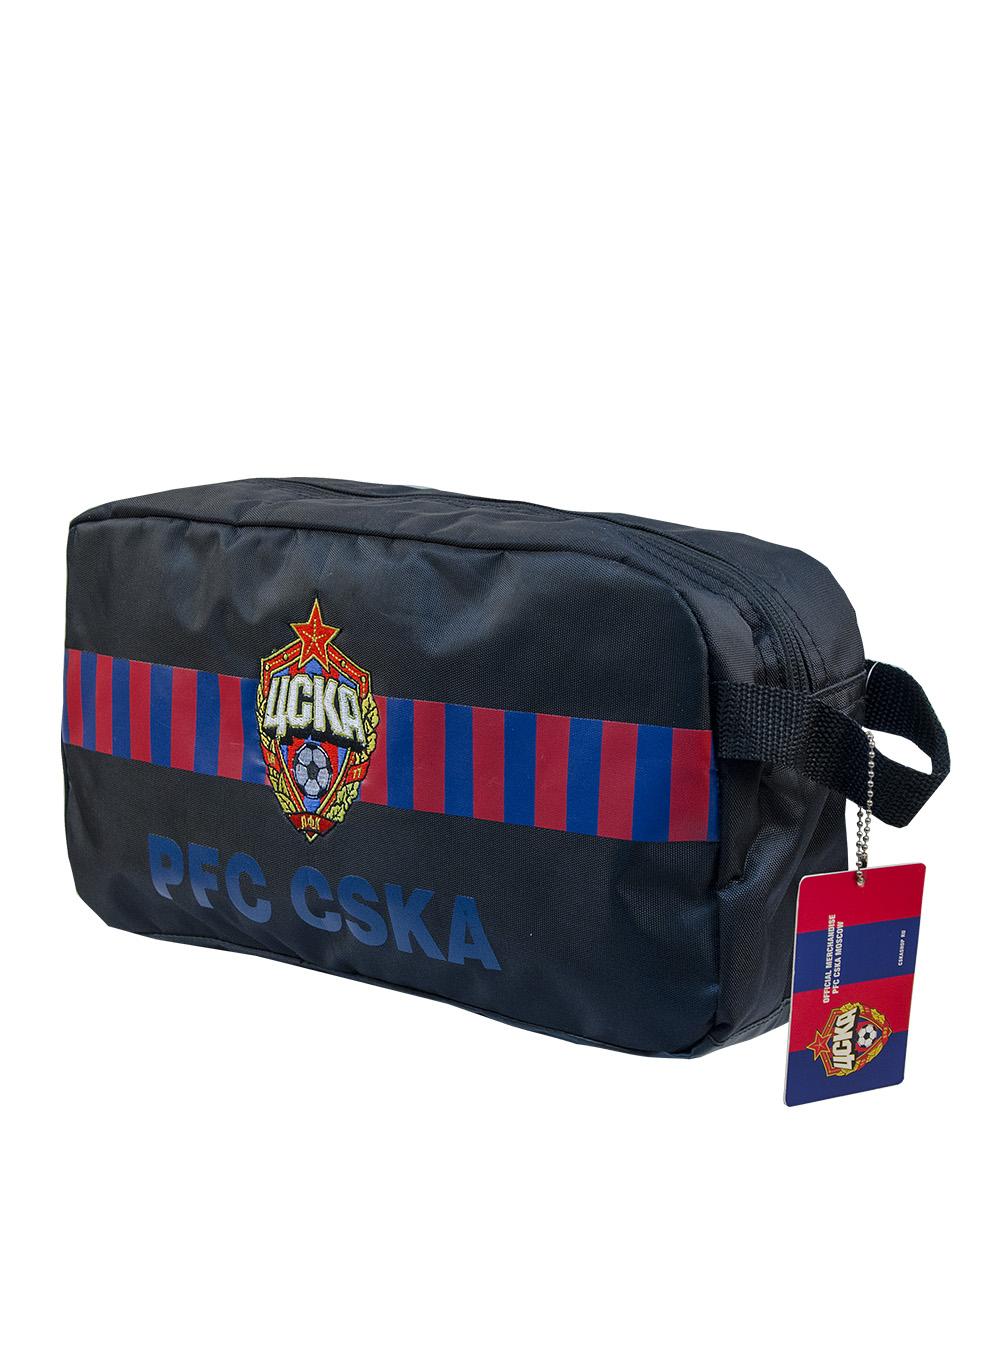 Косметичка, цвет черныйРюкзаки и сумки<br>Косметичка, цвет черный<br>